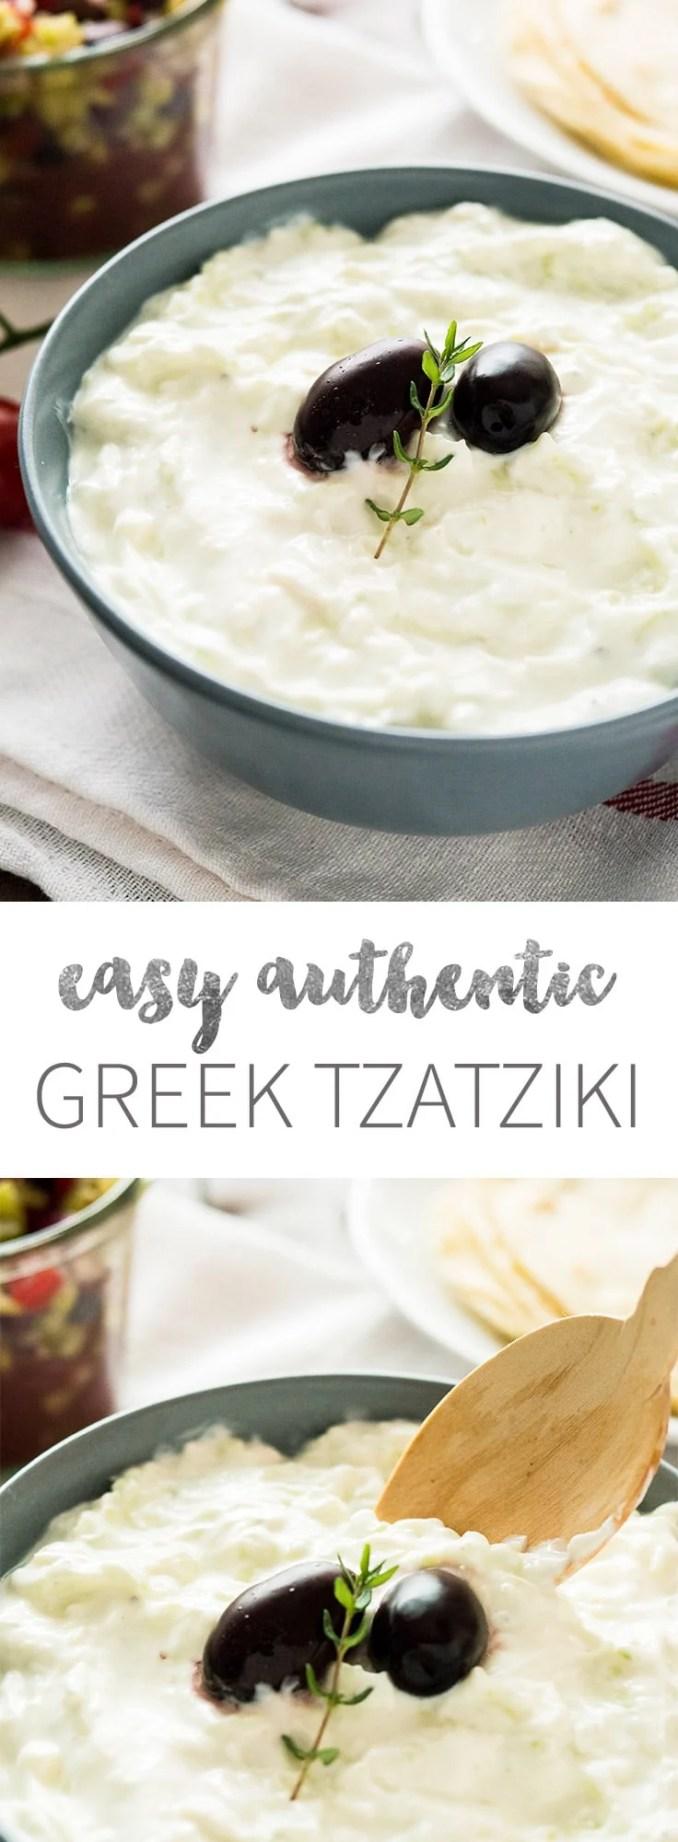 Tzatziki Sauce Recipe | Plated Cravings